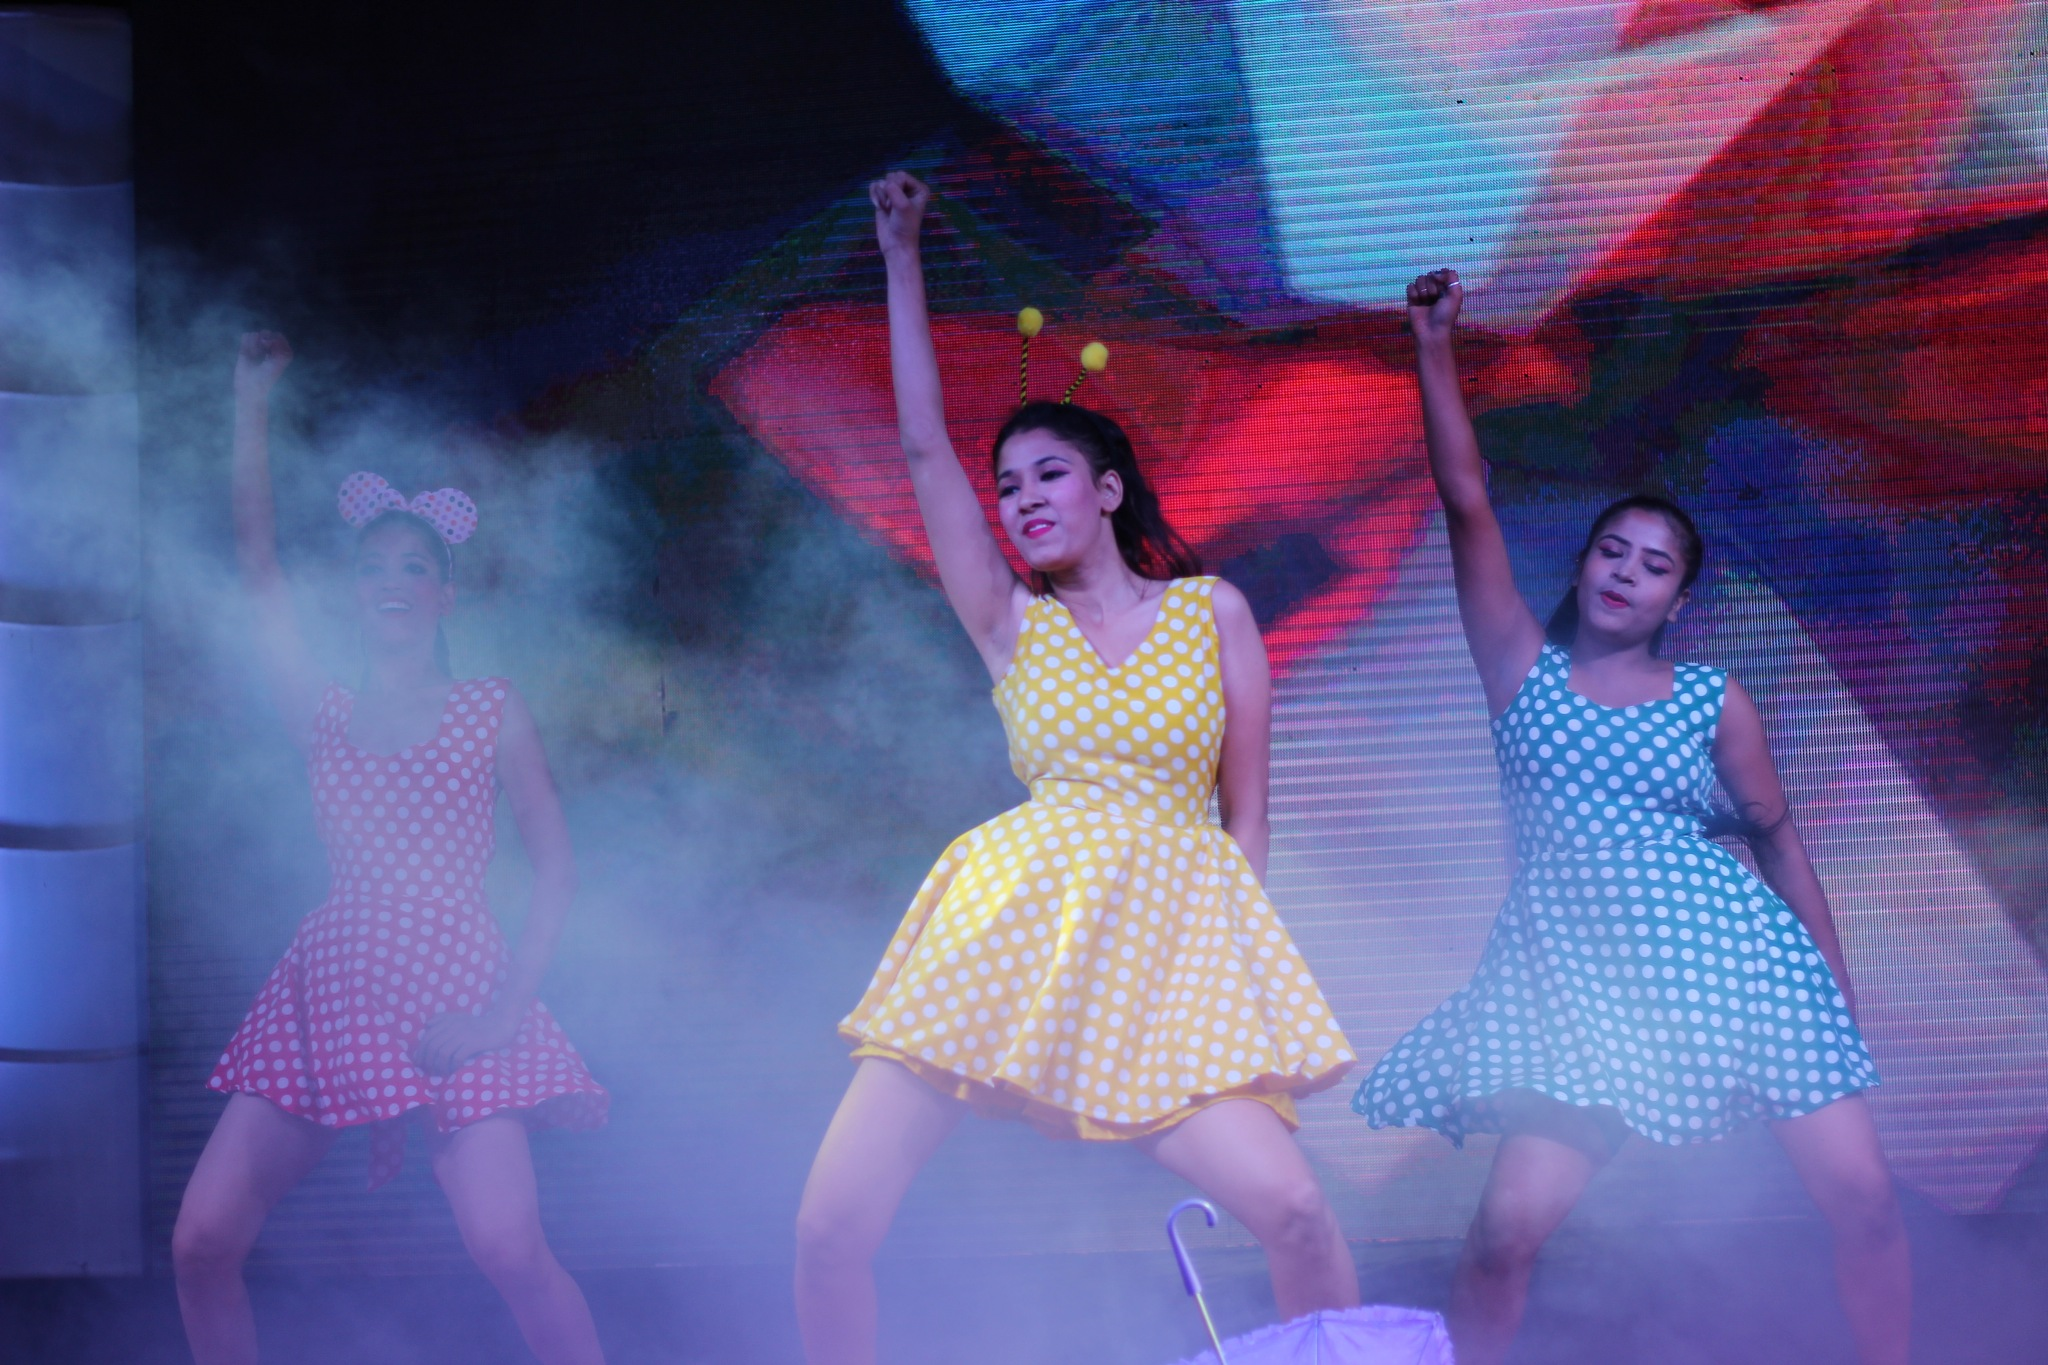 dancing diva by VJ Ankush